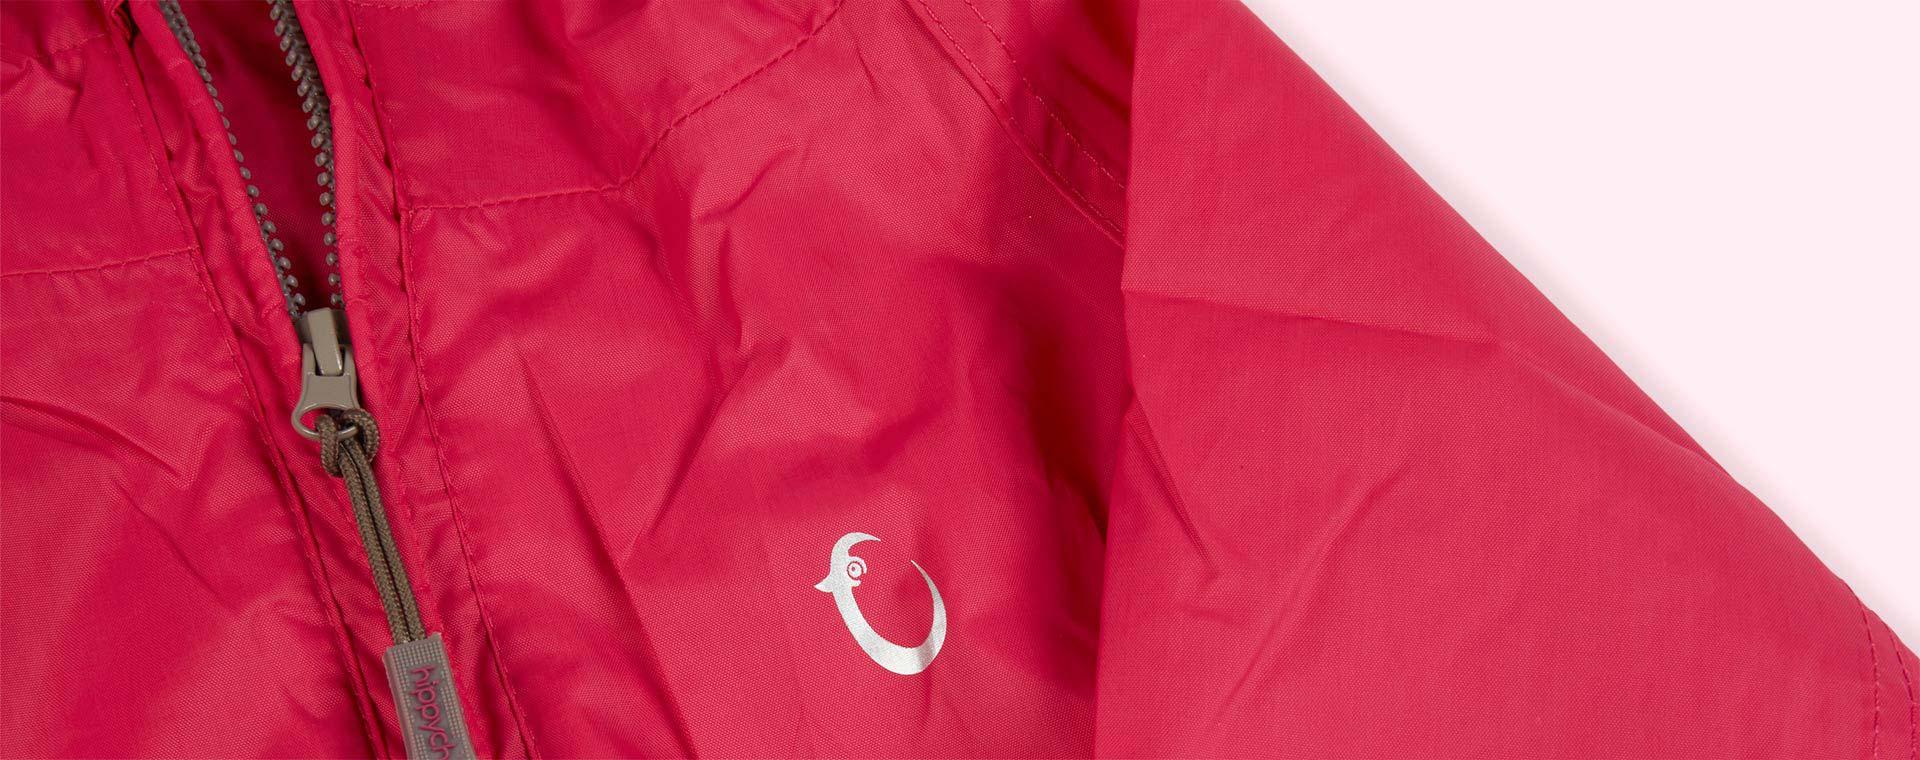 Pink Hippychick Packasuit Waterproof All-In-One